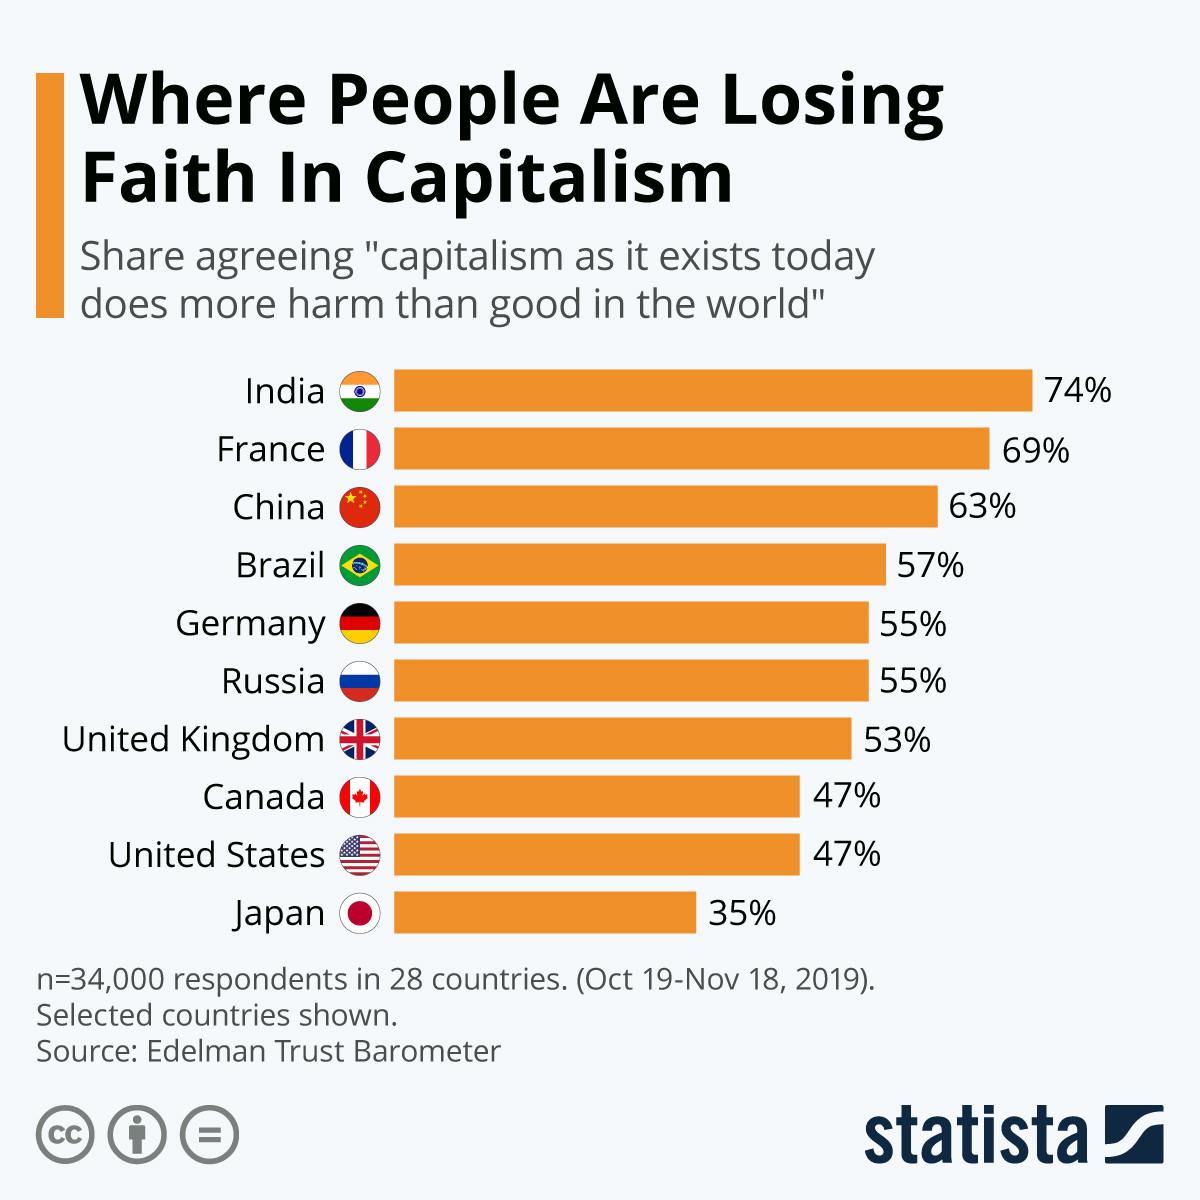 capitalism countries global comparison india france china brazil germany russia united kingdom canada united states statista stats capitalism markets economics